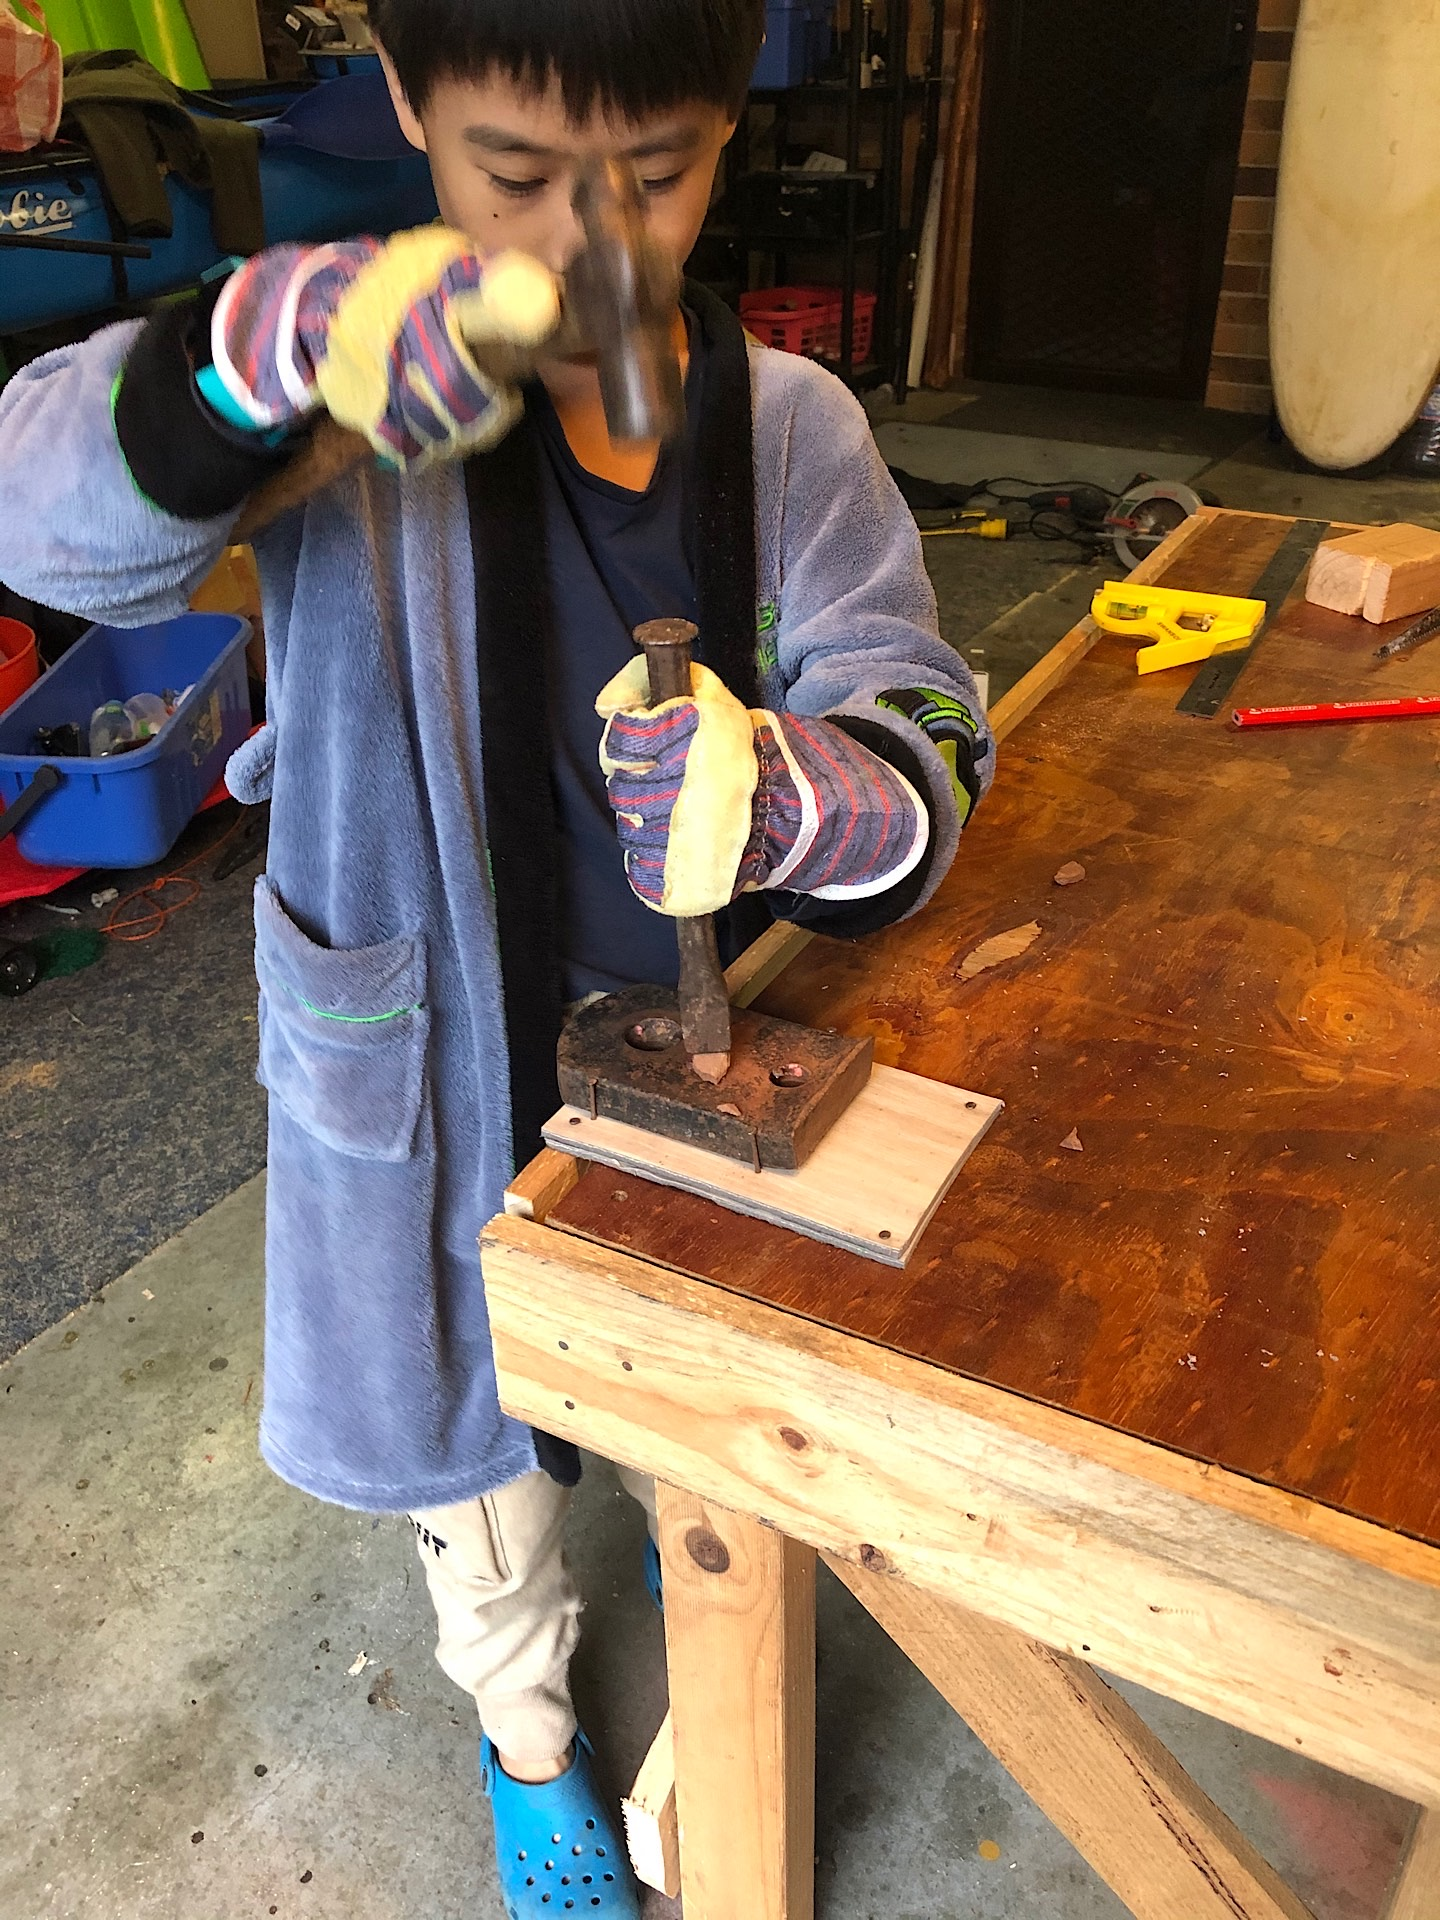 Testing his workbench anvil